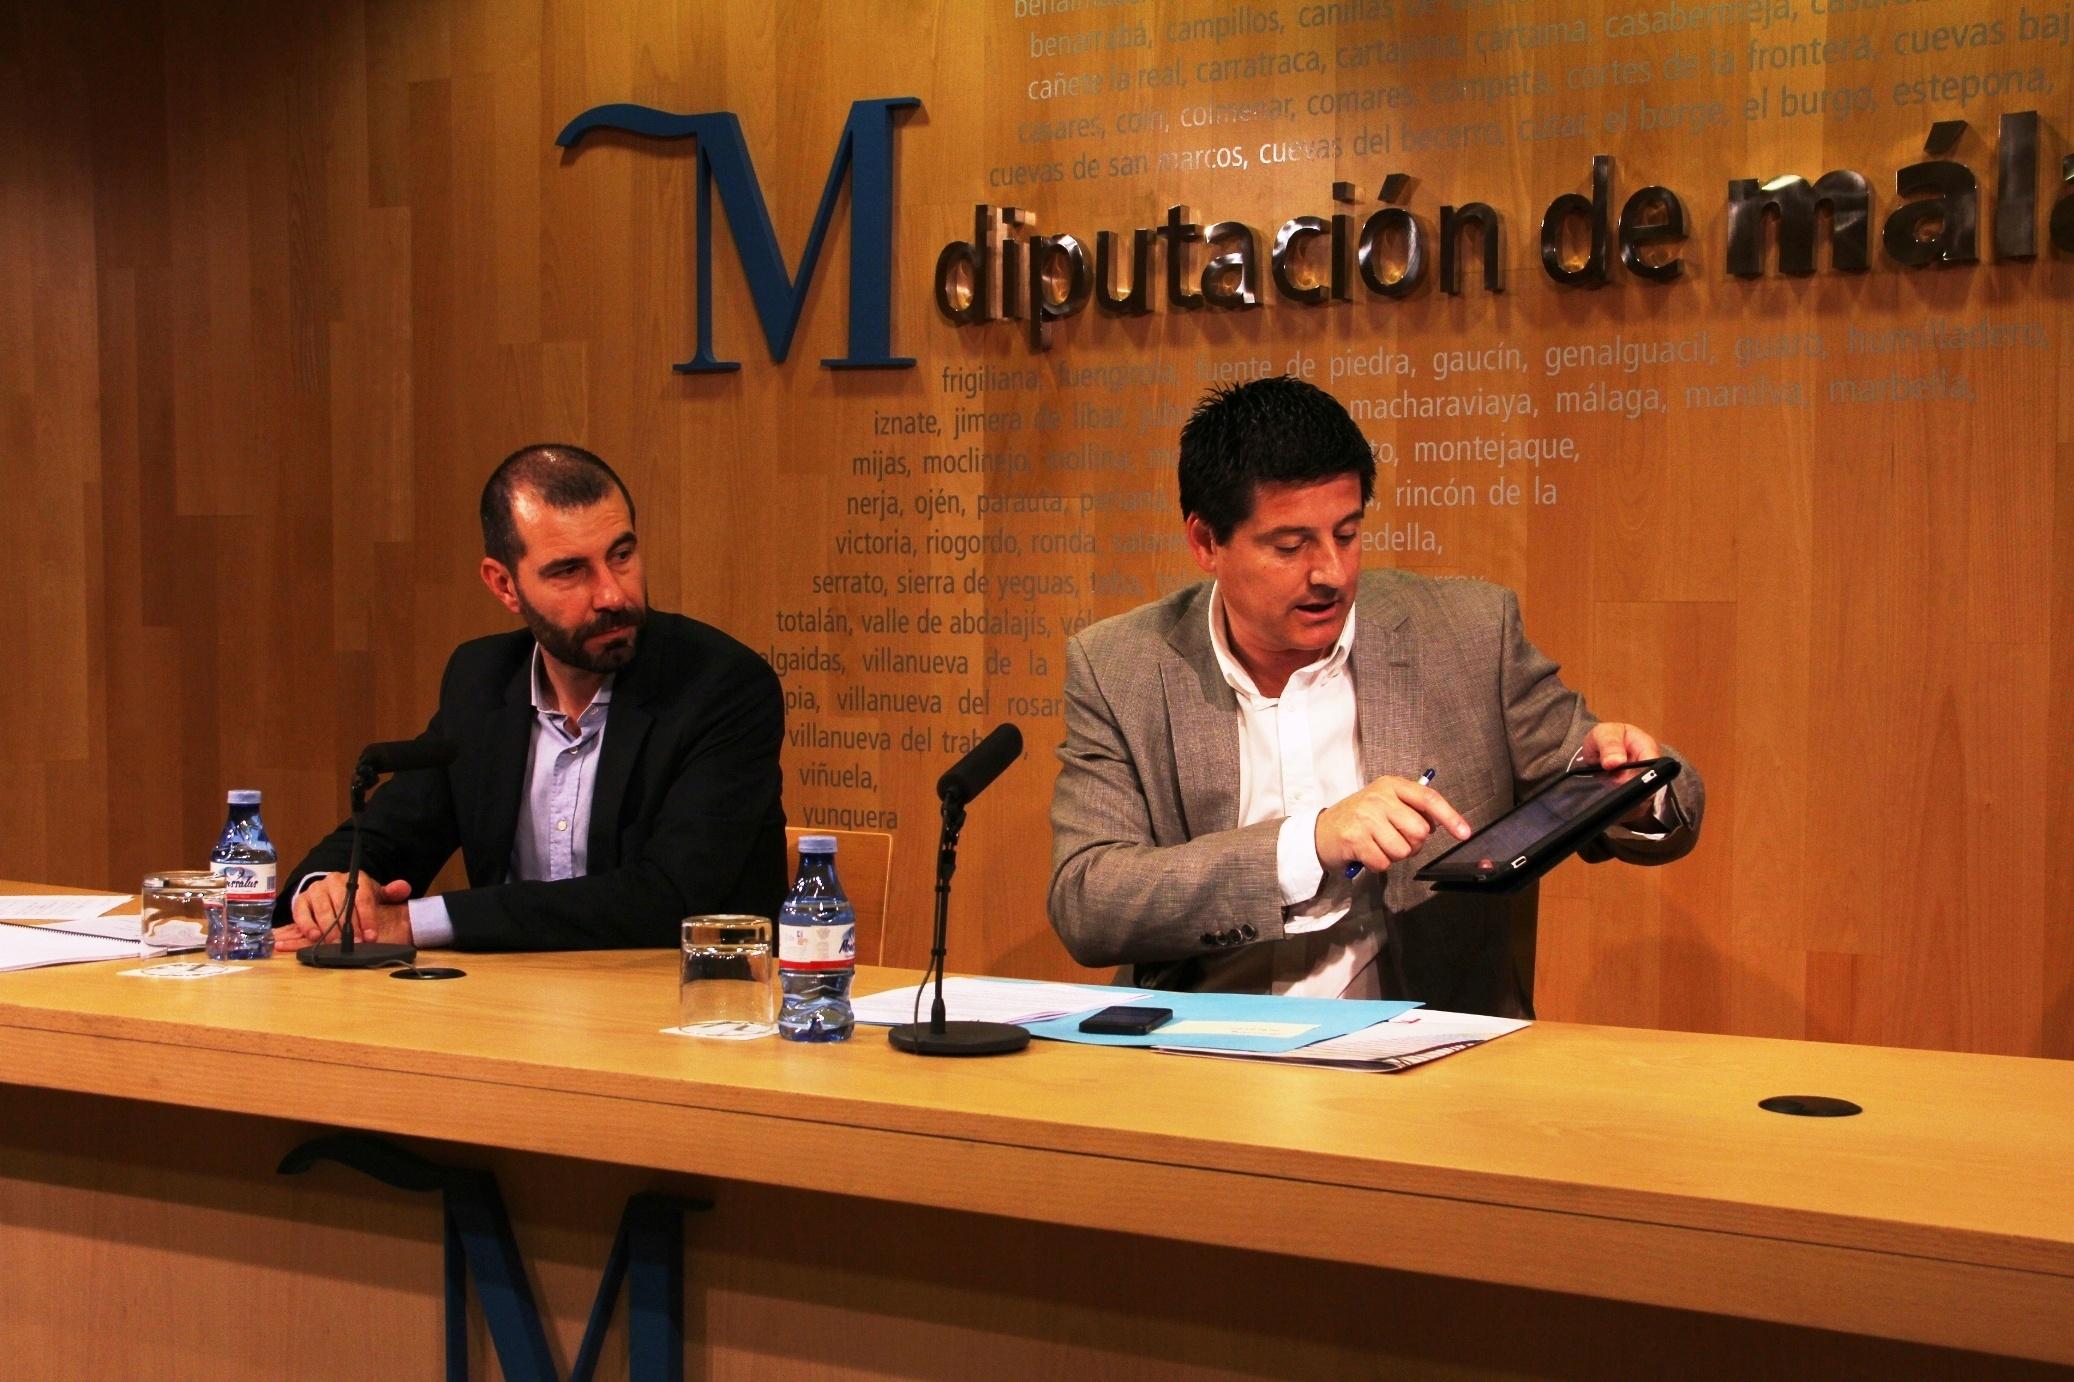 Un informe detecta como debilidades de Diputación un exceso de burocracia y falta de comunicación interna